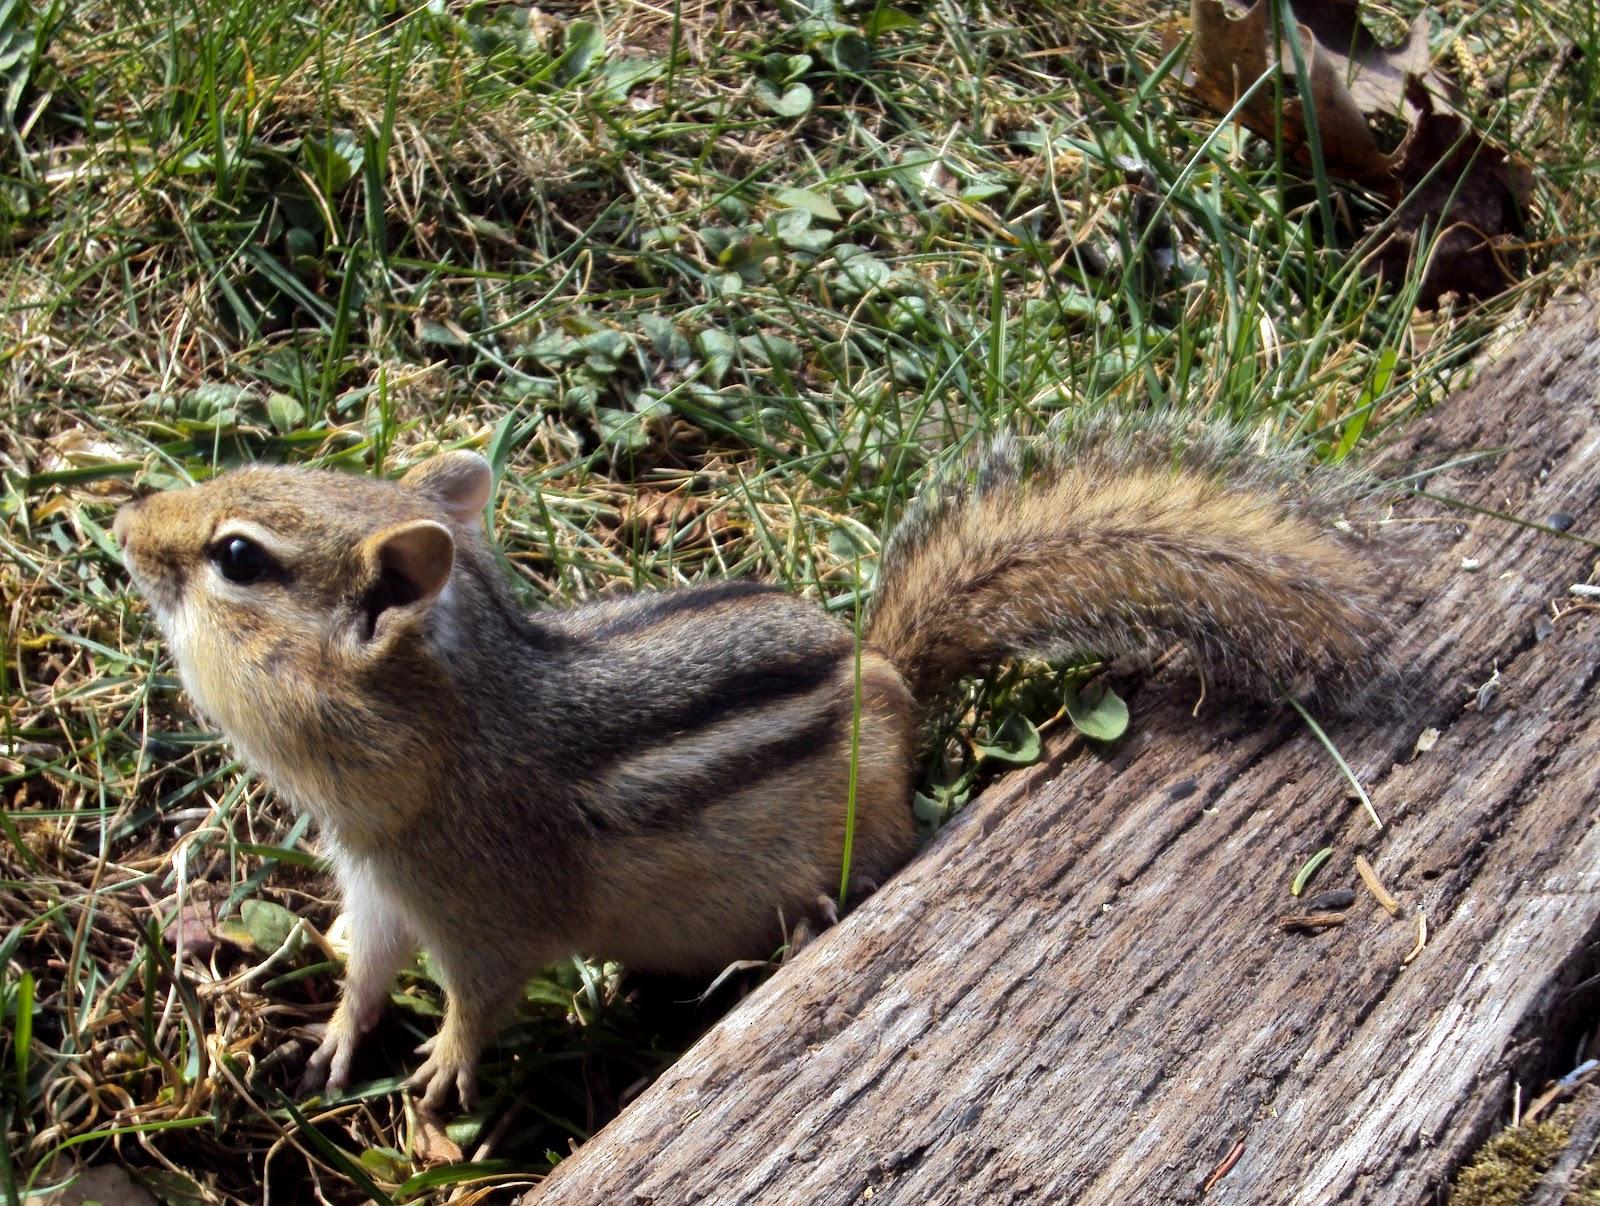 ANIMALS PLANET: Cute Animals